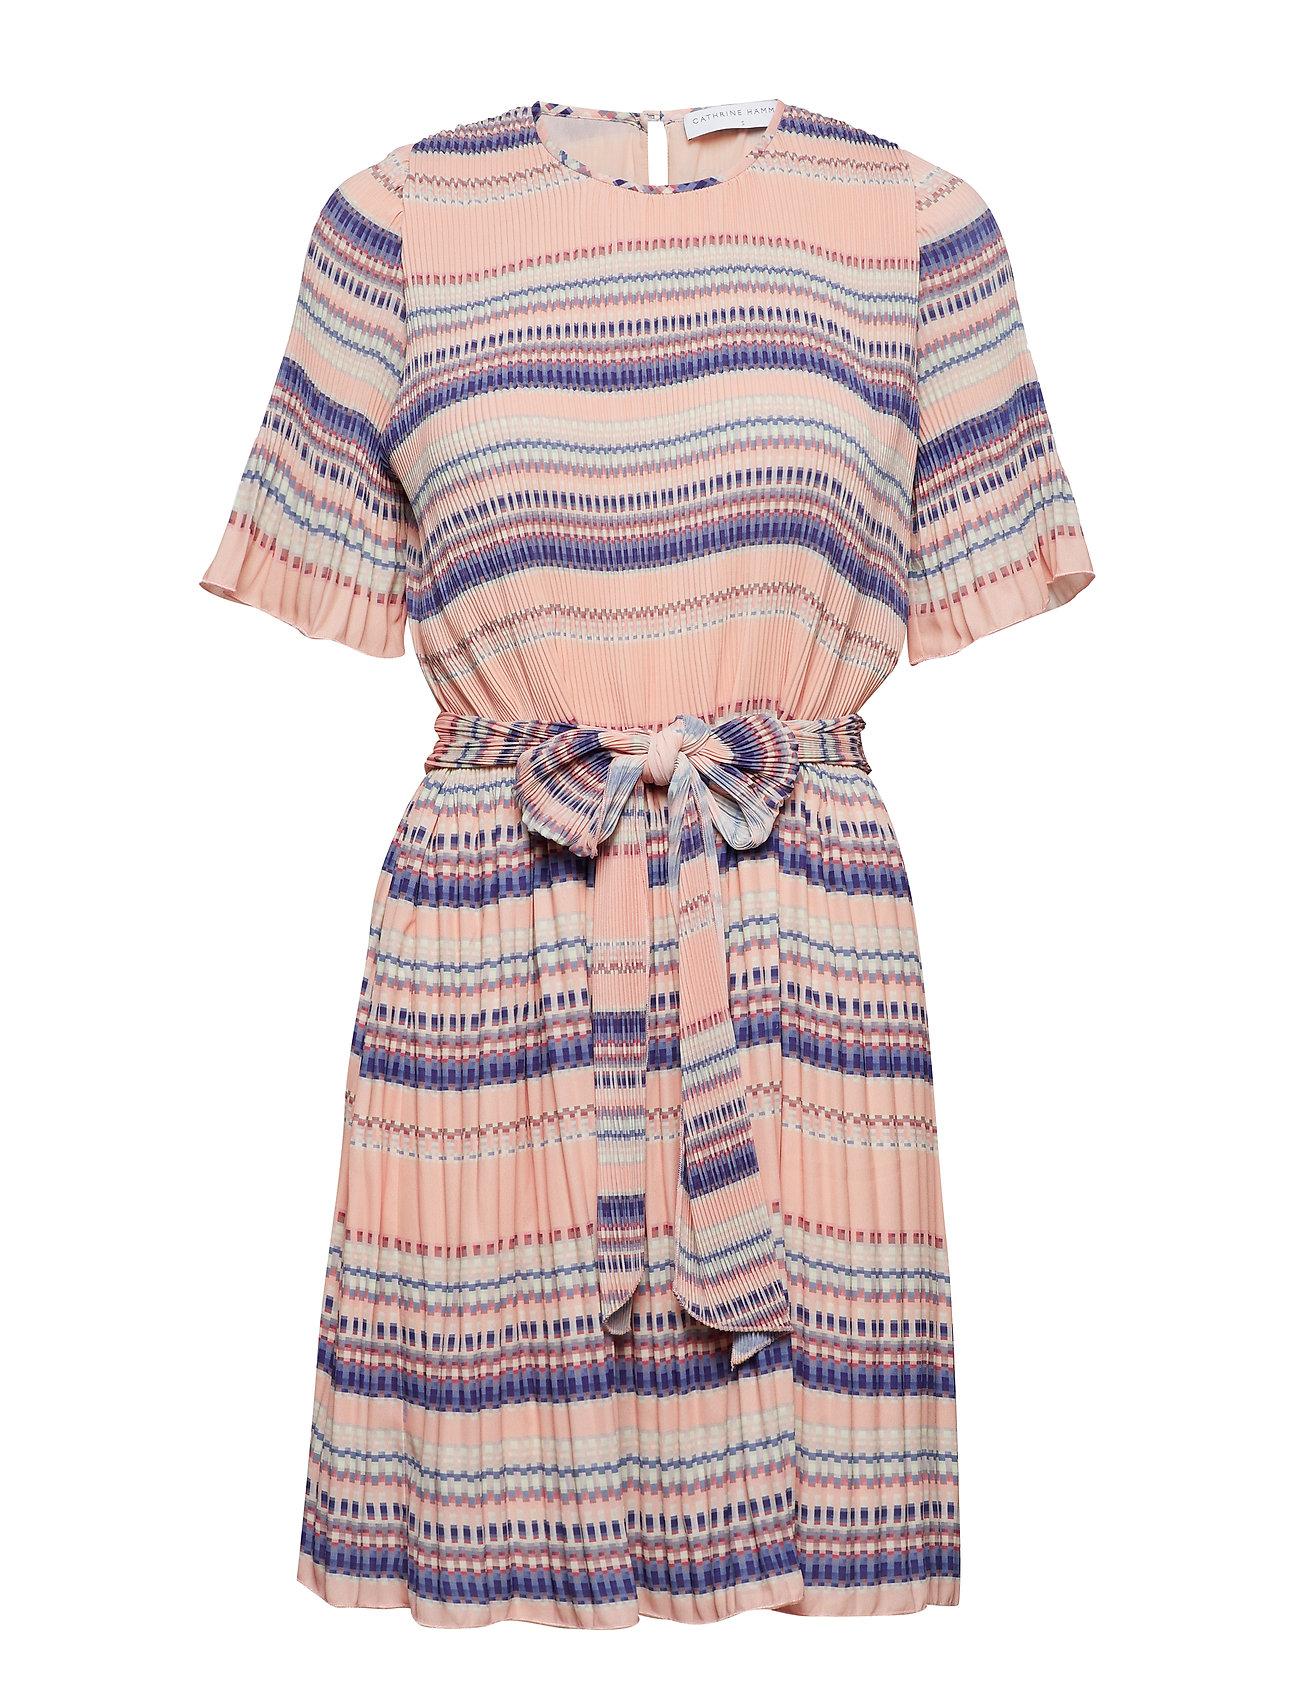 Cathrine Hammel Miami dress w/short sleeves - PLEAT 11